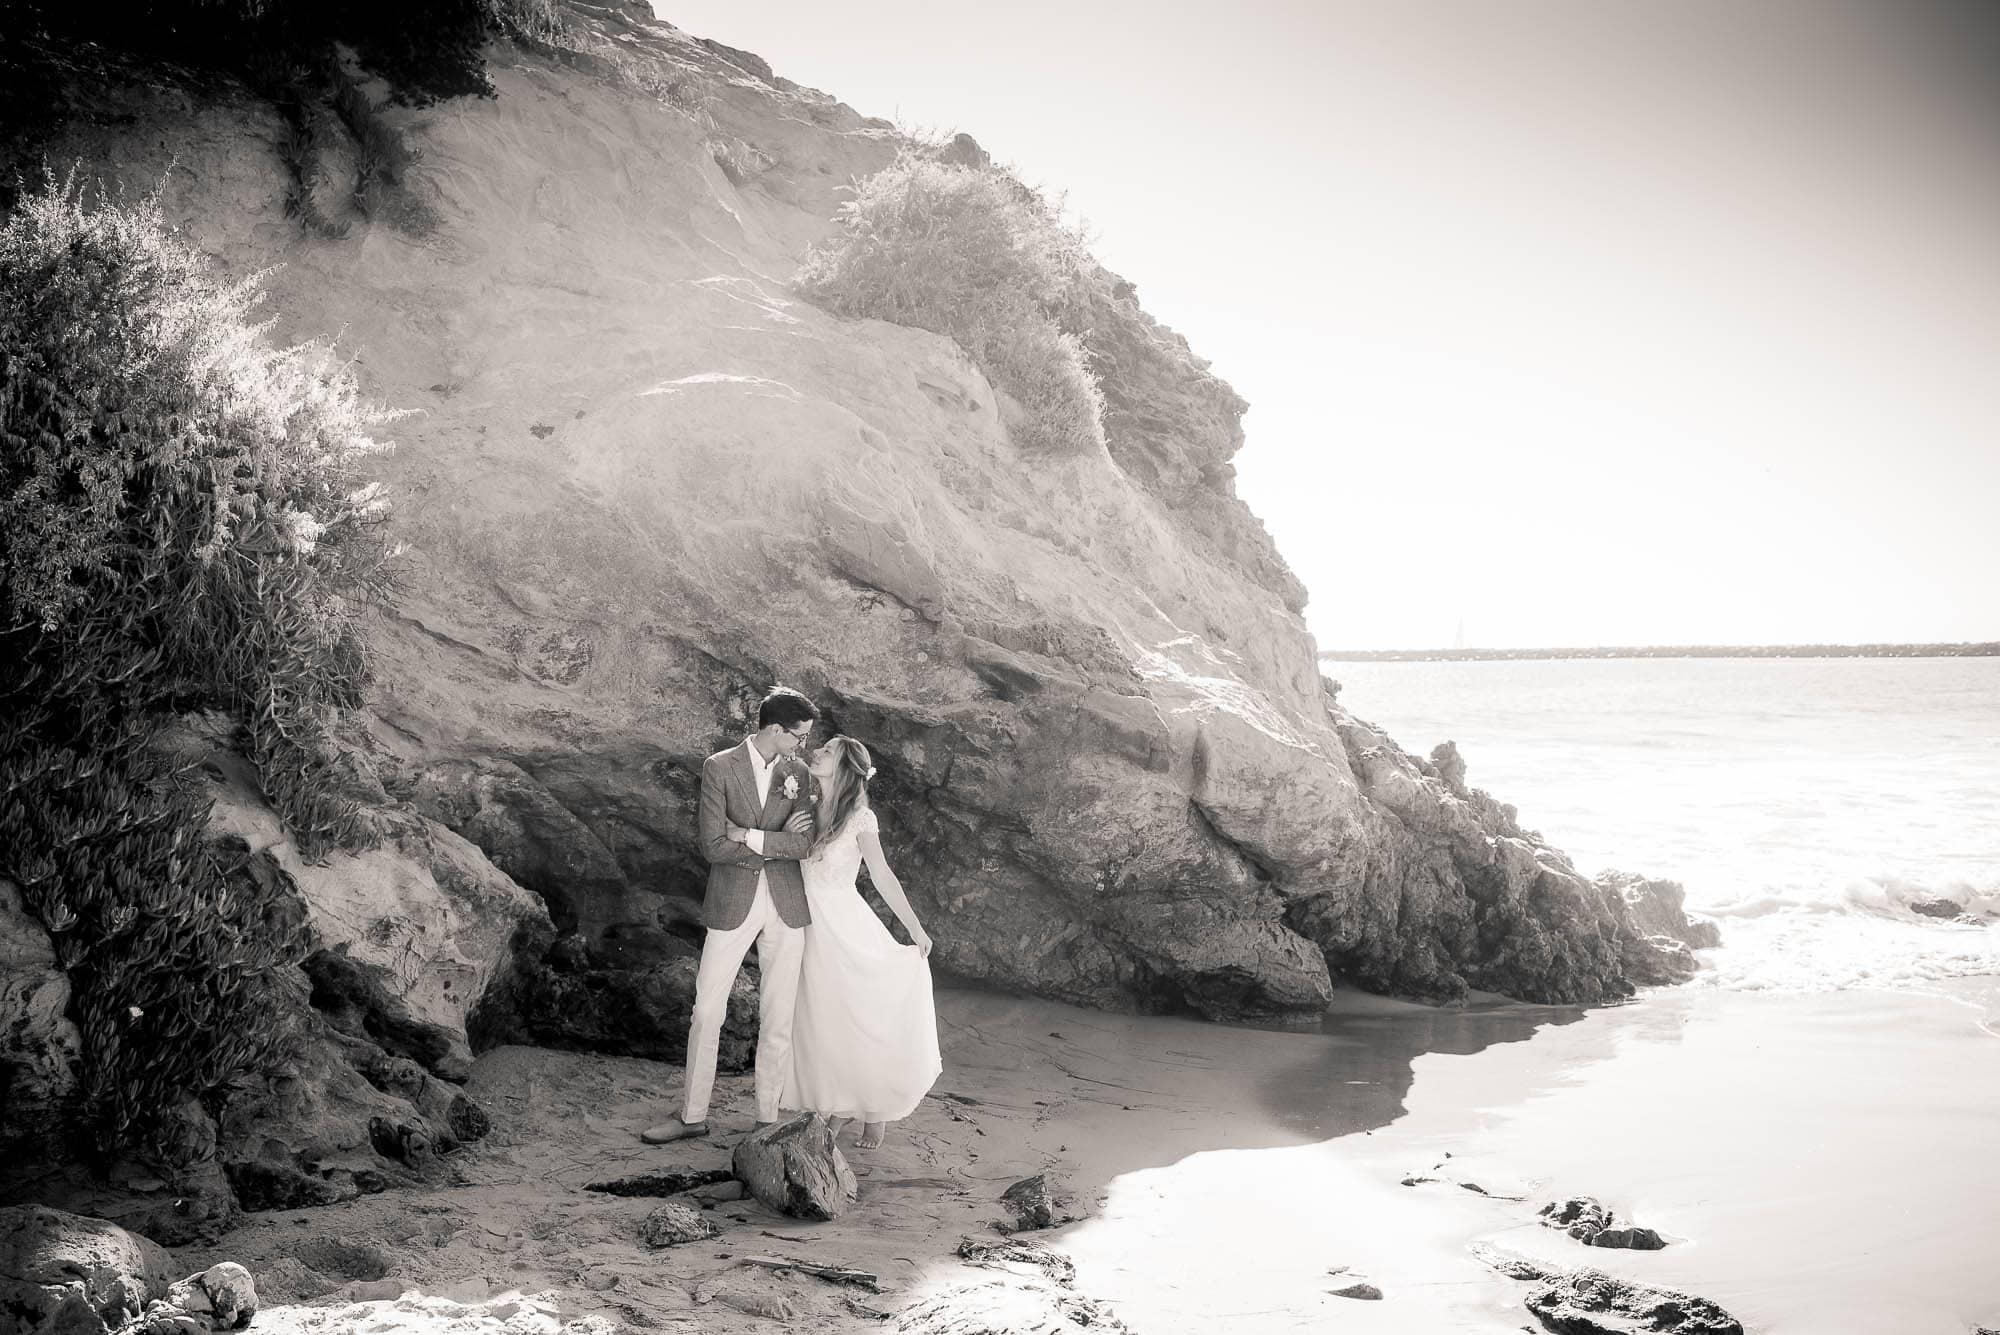 047_Alan_and_Heidi_Wedding_Verena_Andreas